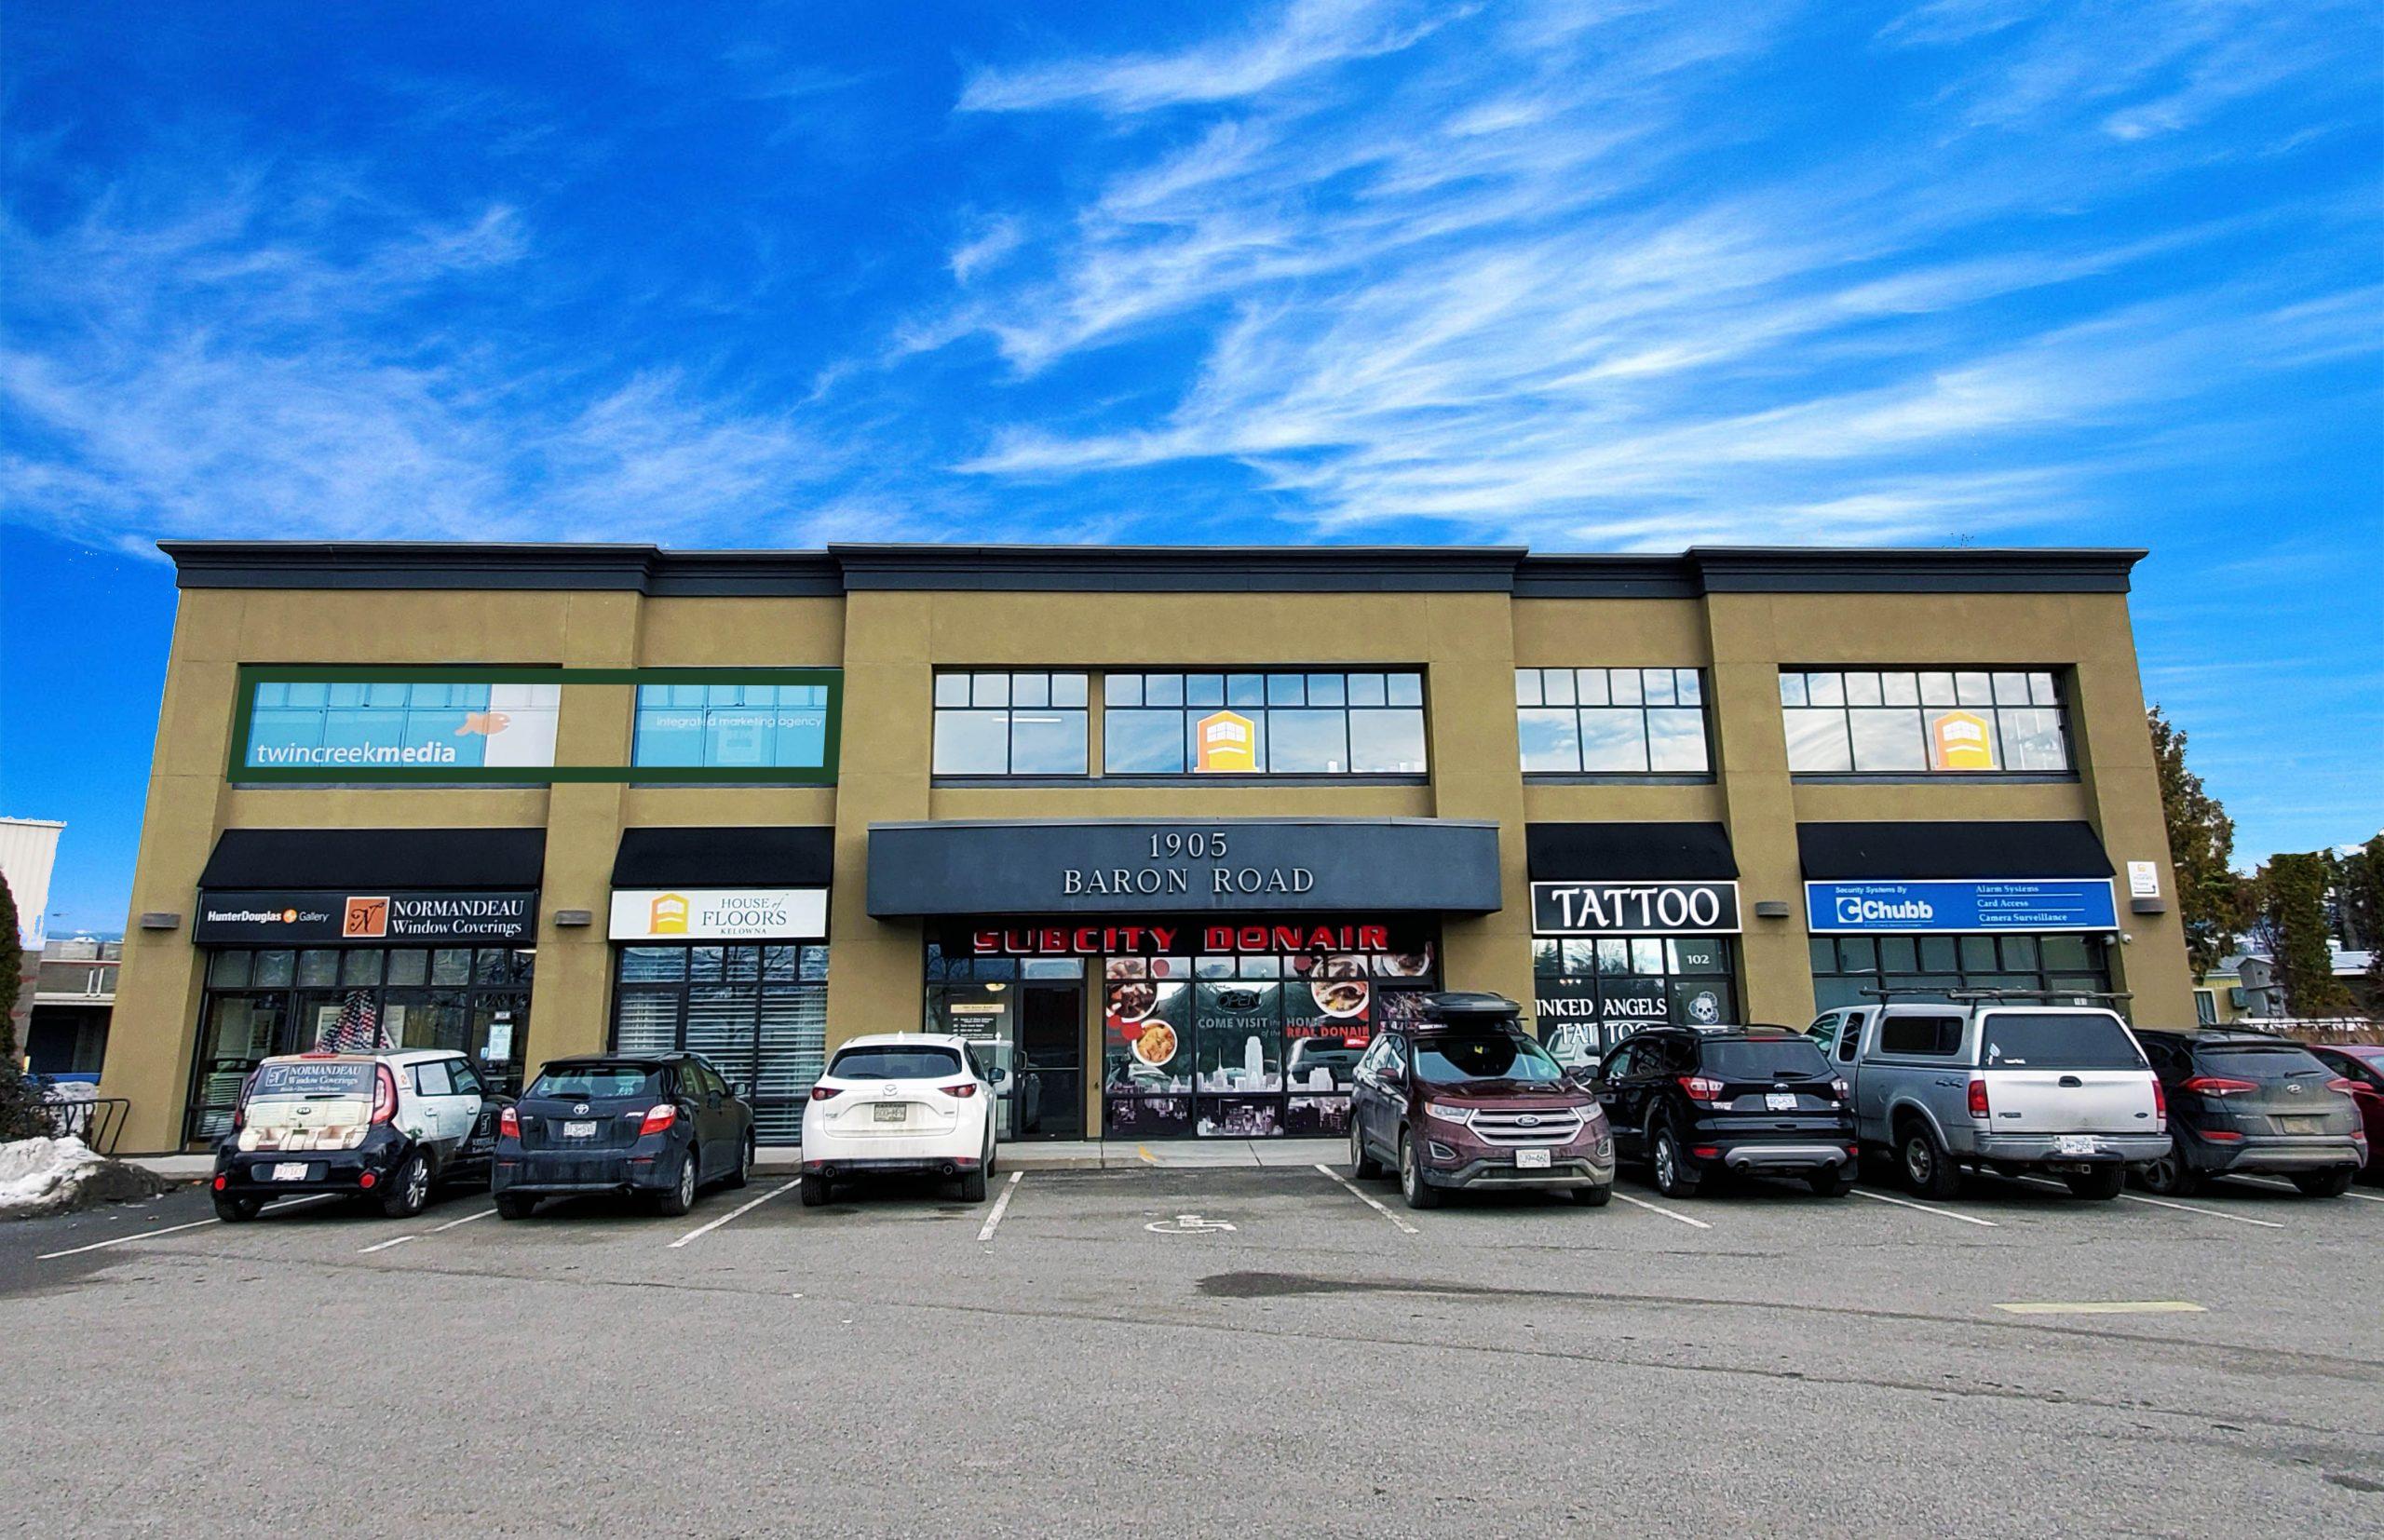 #202-1905 Baron Road, Kelowna, BC - High Exposure Office Space in Central Kelowna